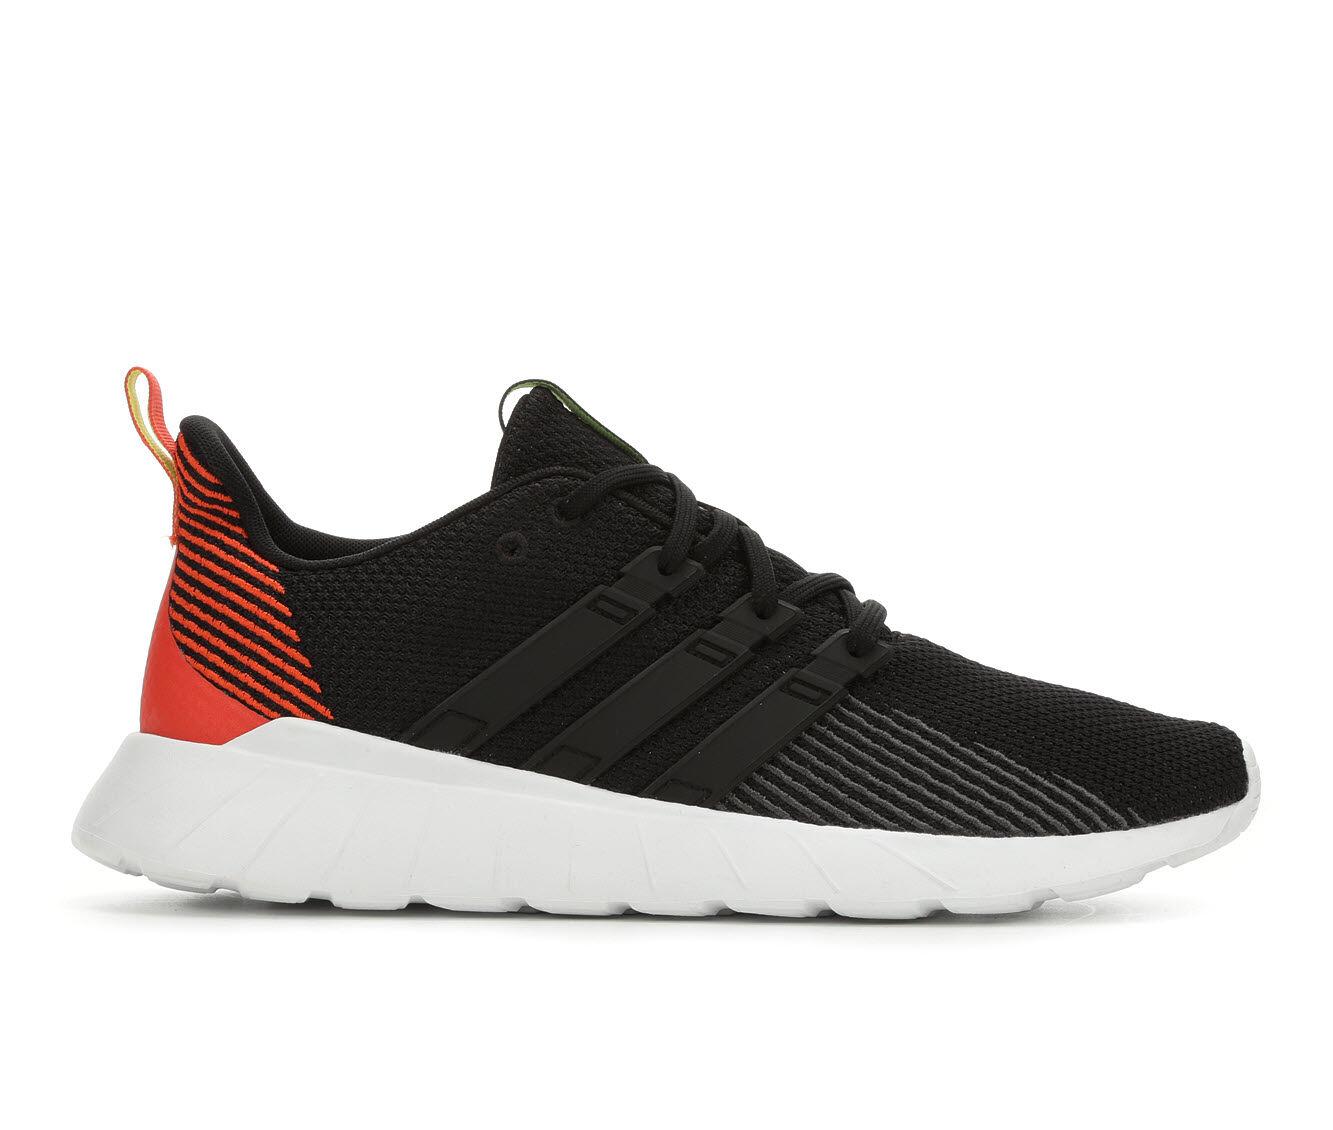 Men's Adidas Questar Flow Running Shoes Blk/Org/Wht